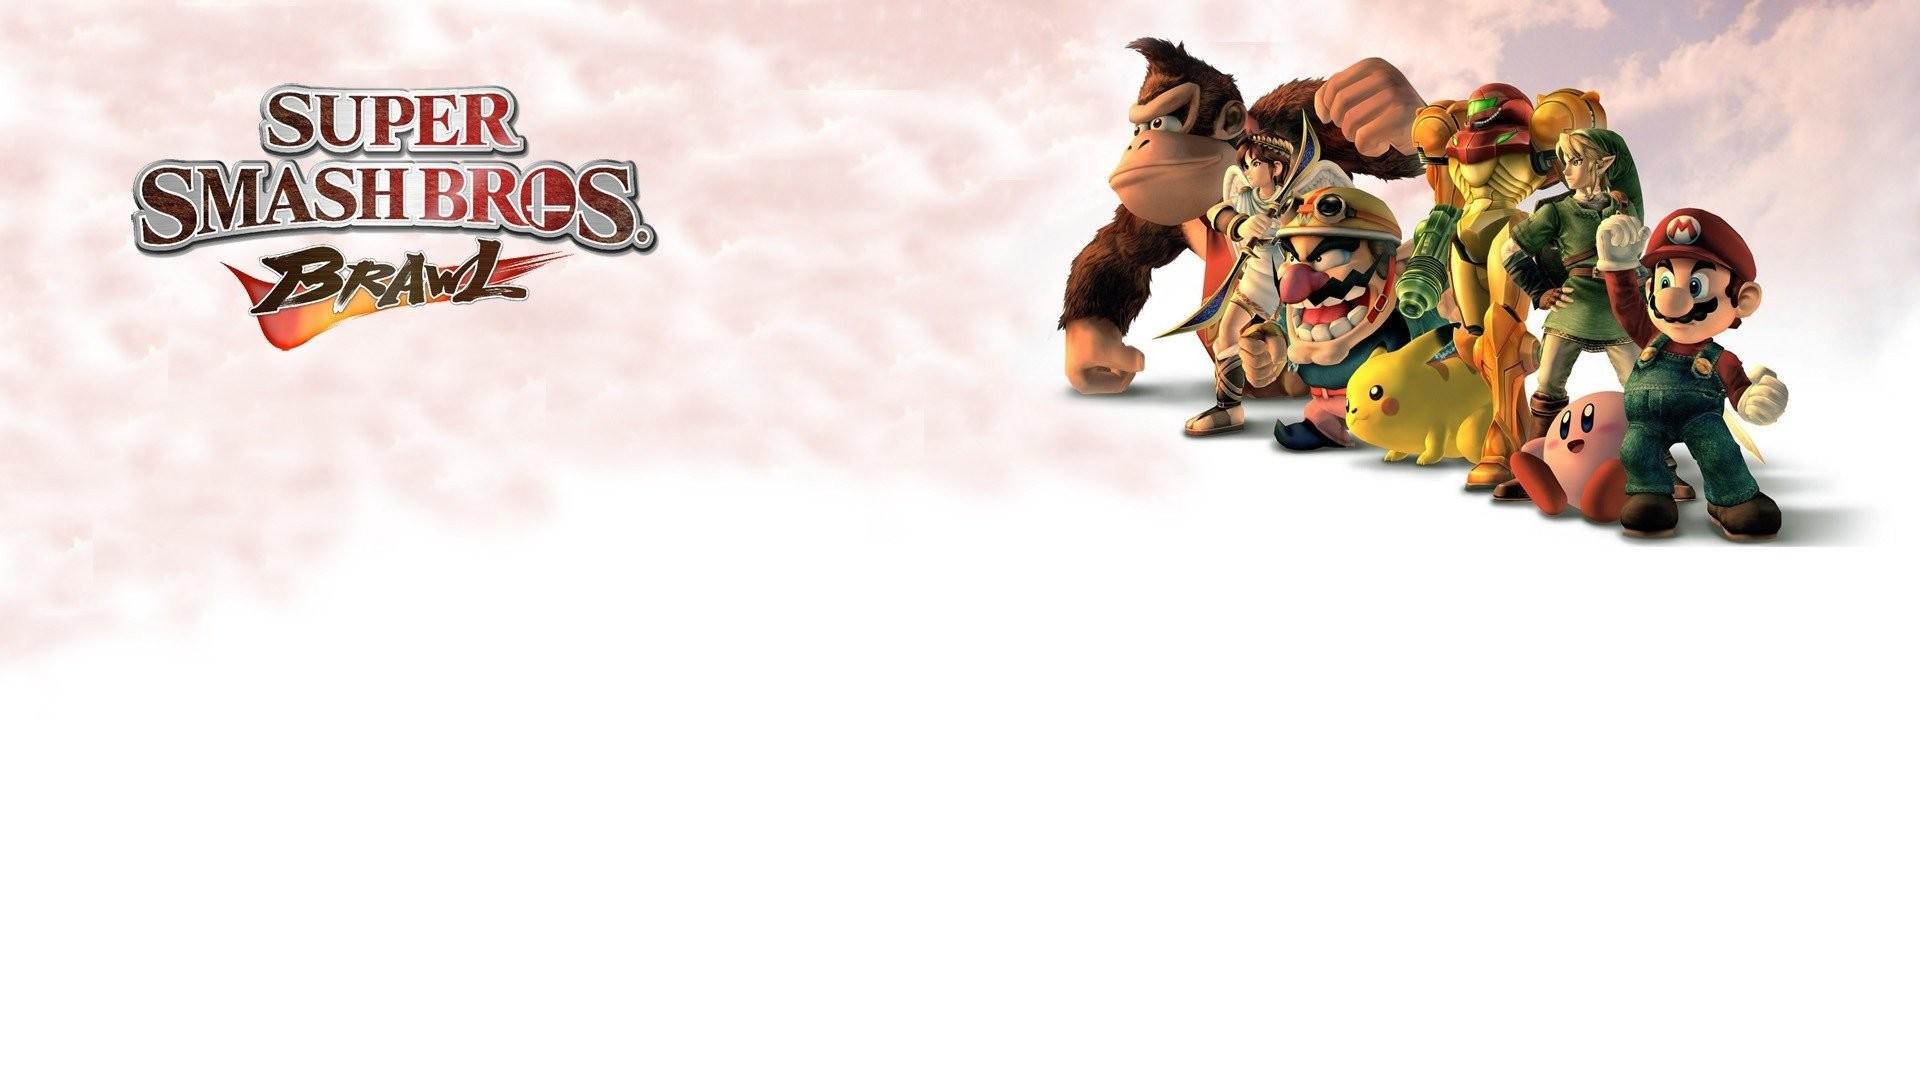 Super Smash Bros Brawl Wallpaper Wallpapertag